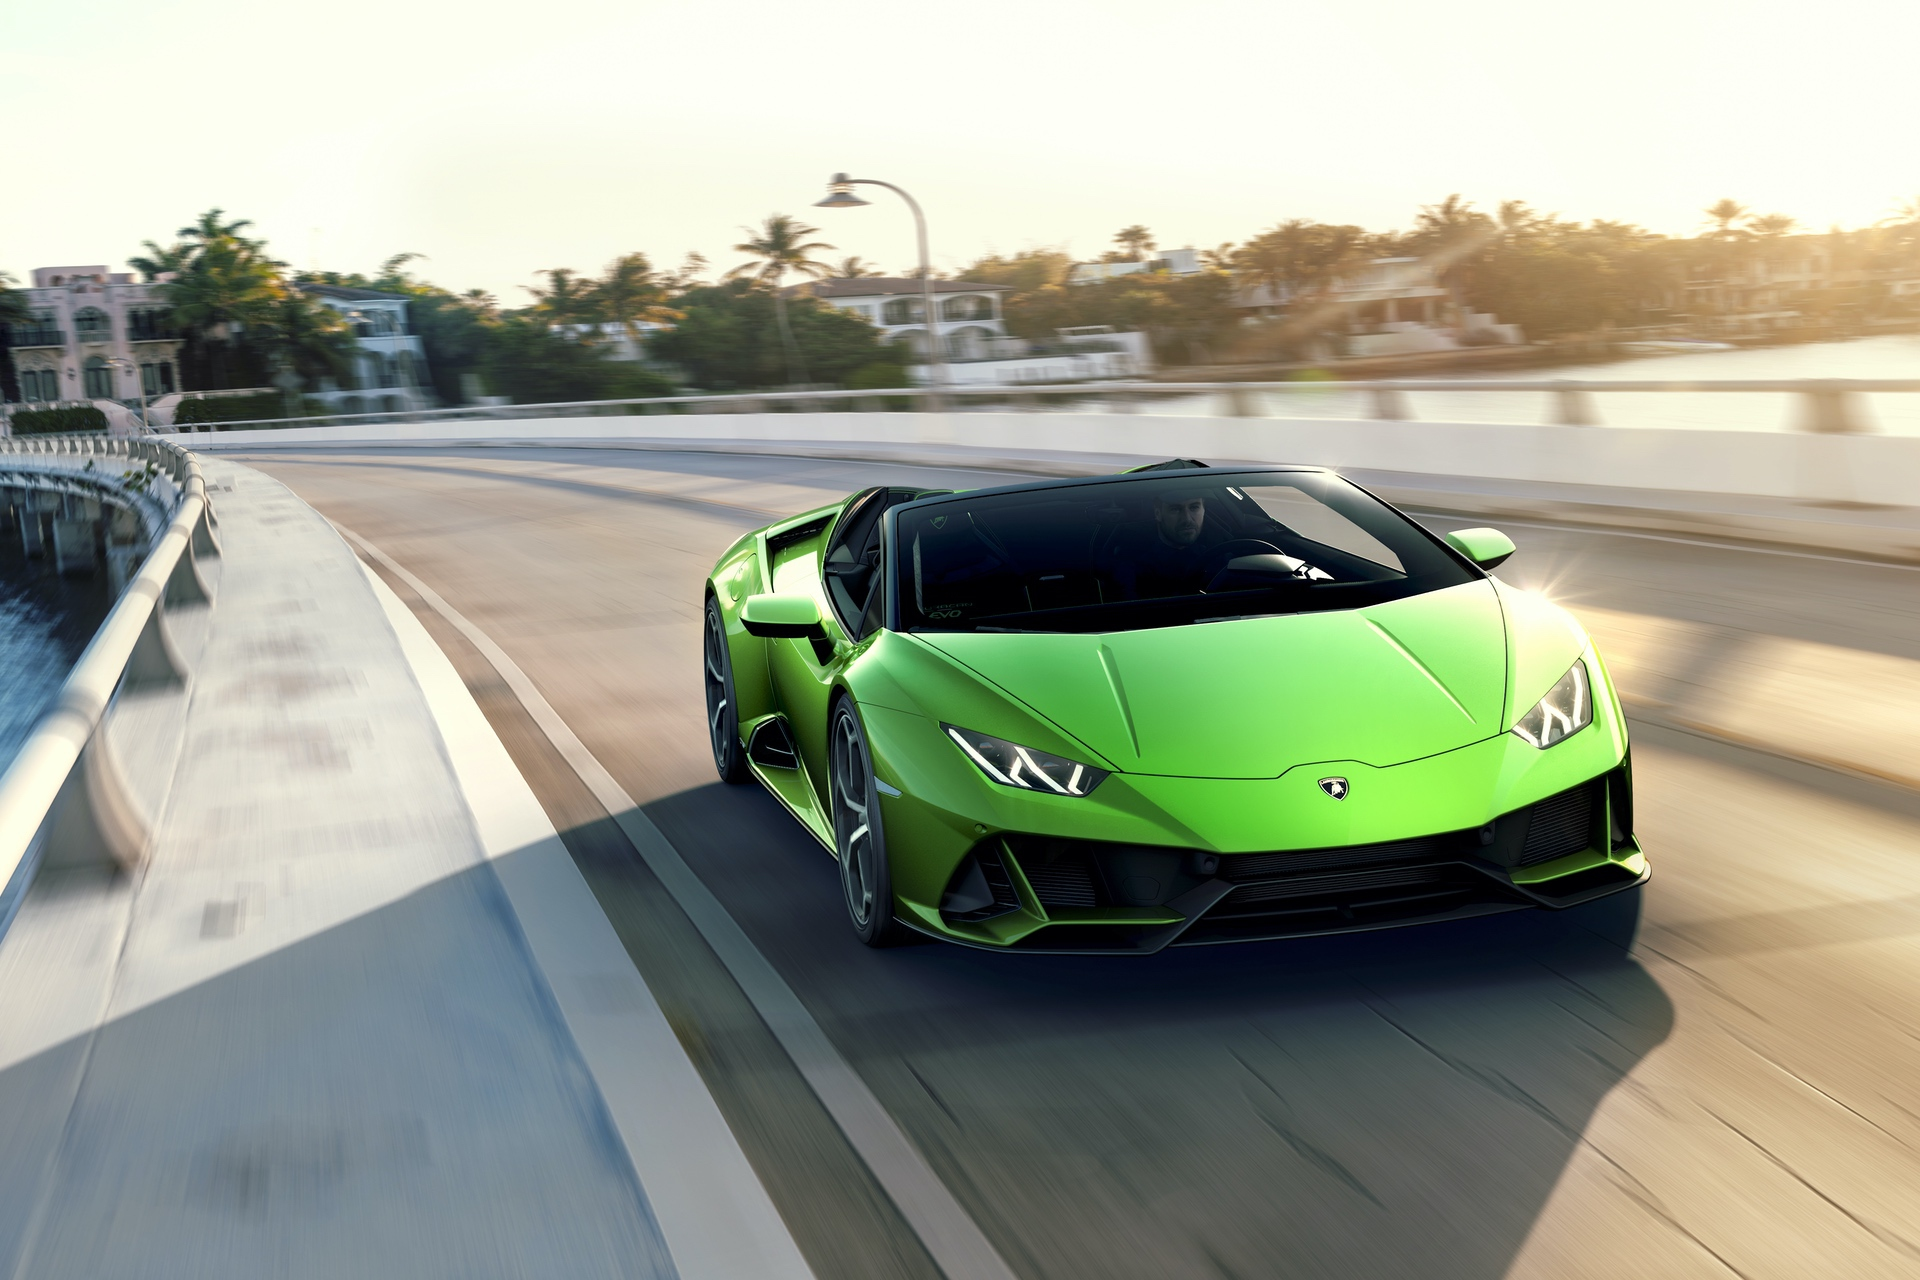 Lamborghini_Huracan_Evo_Spyder_0007